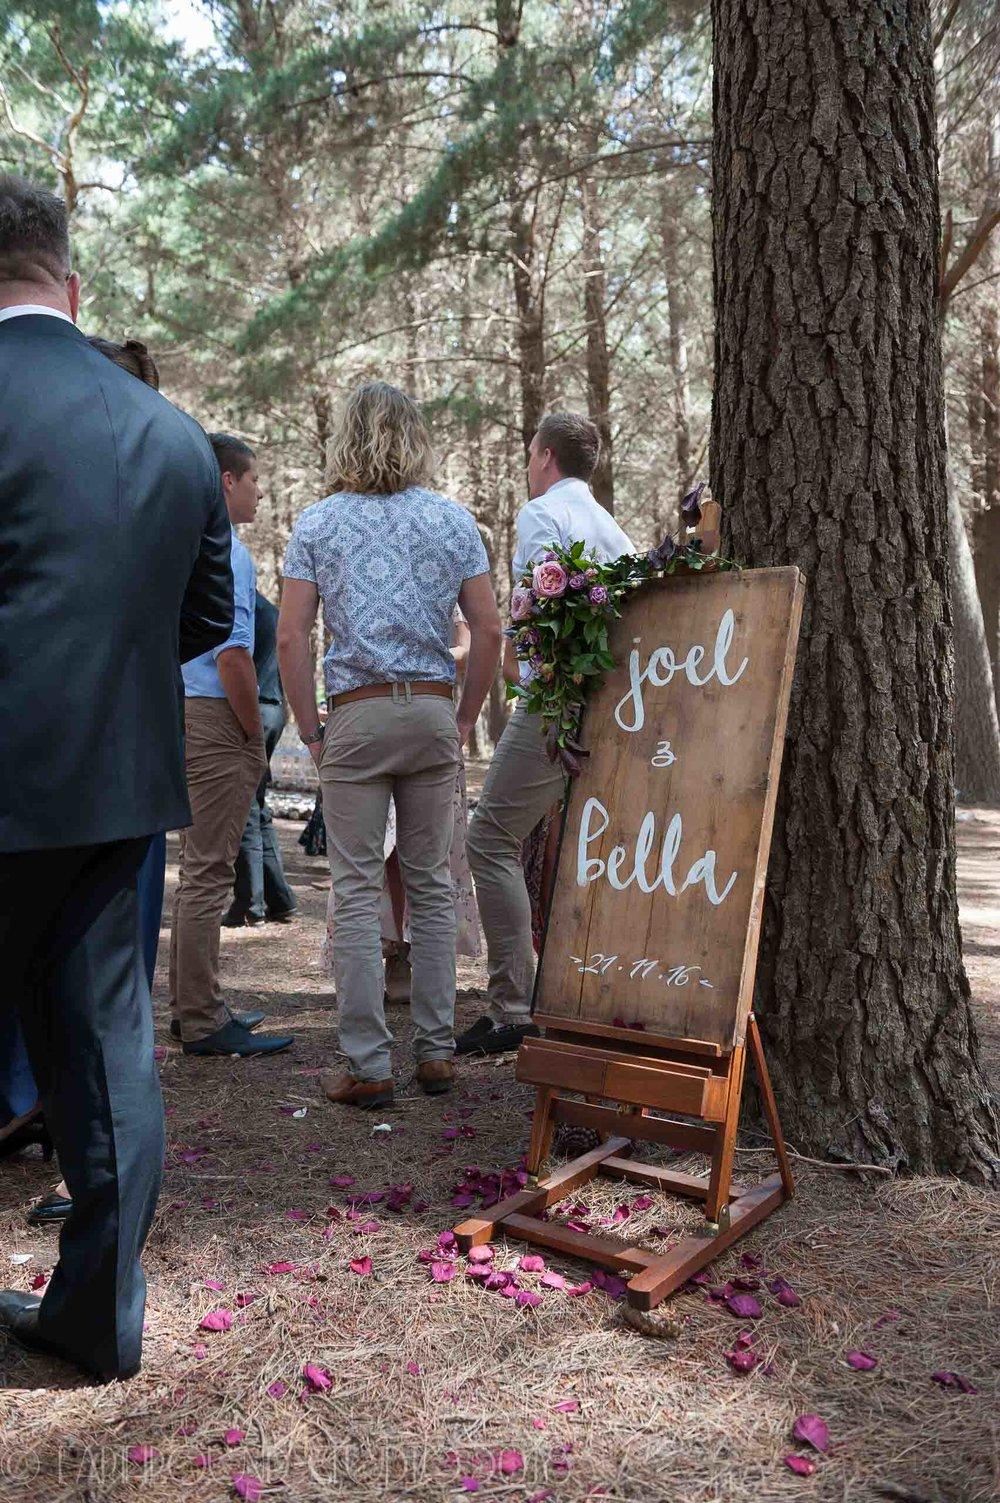 20161121-151829Joel&Bella_Wedding.jpg